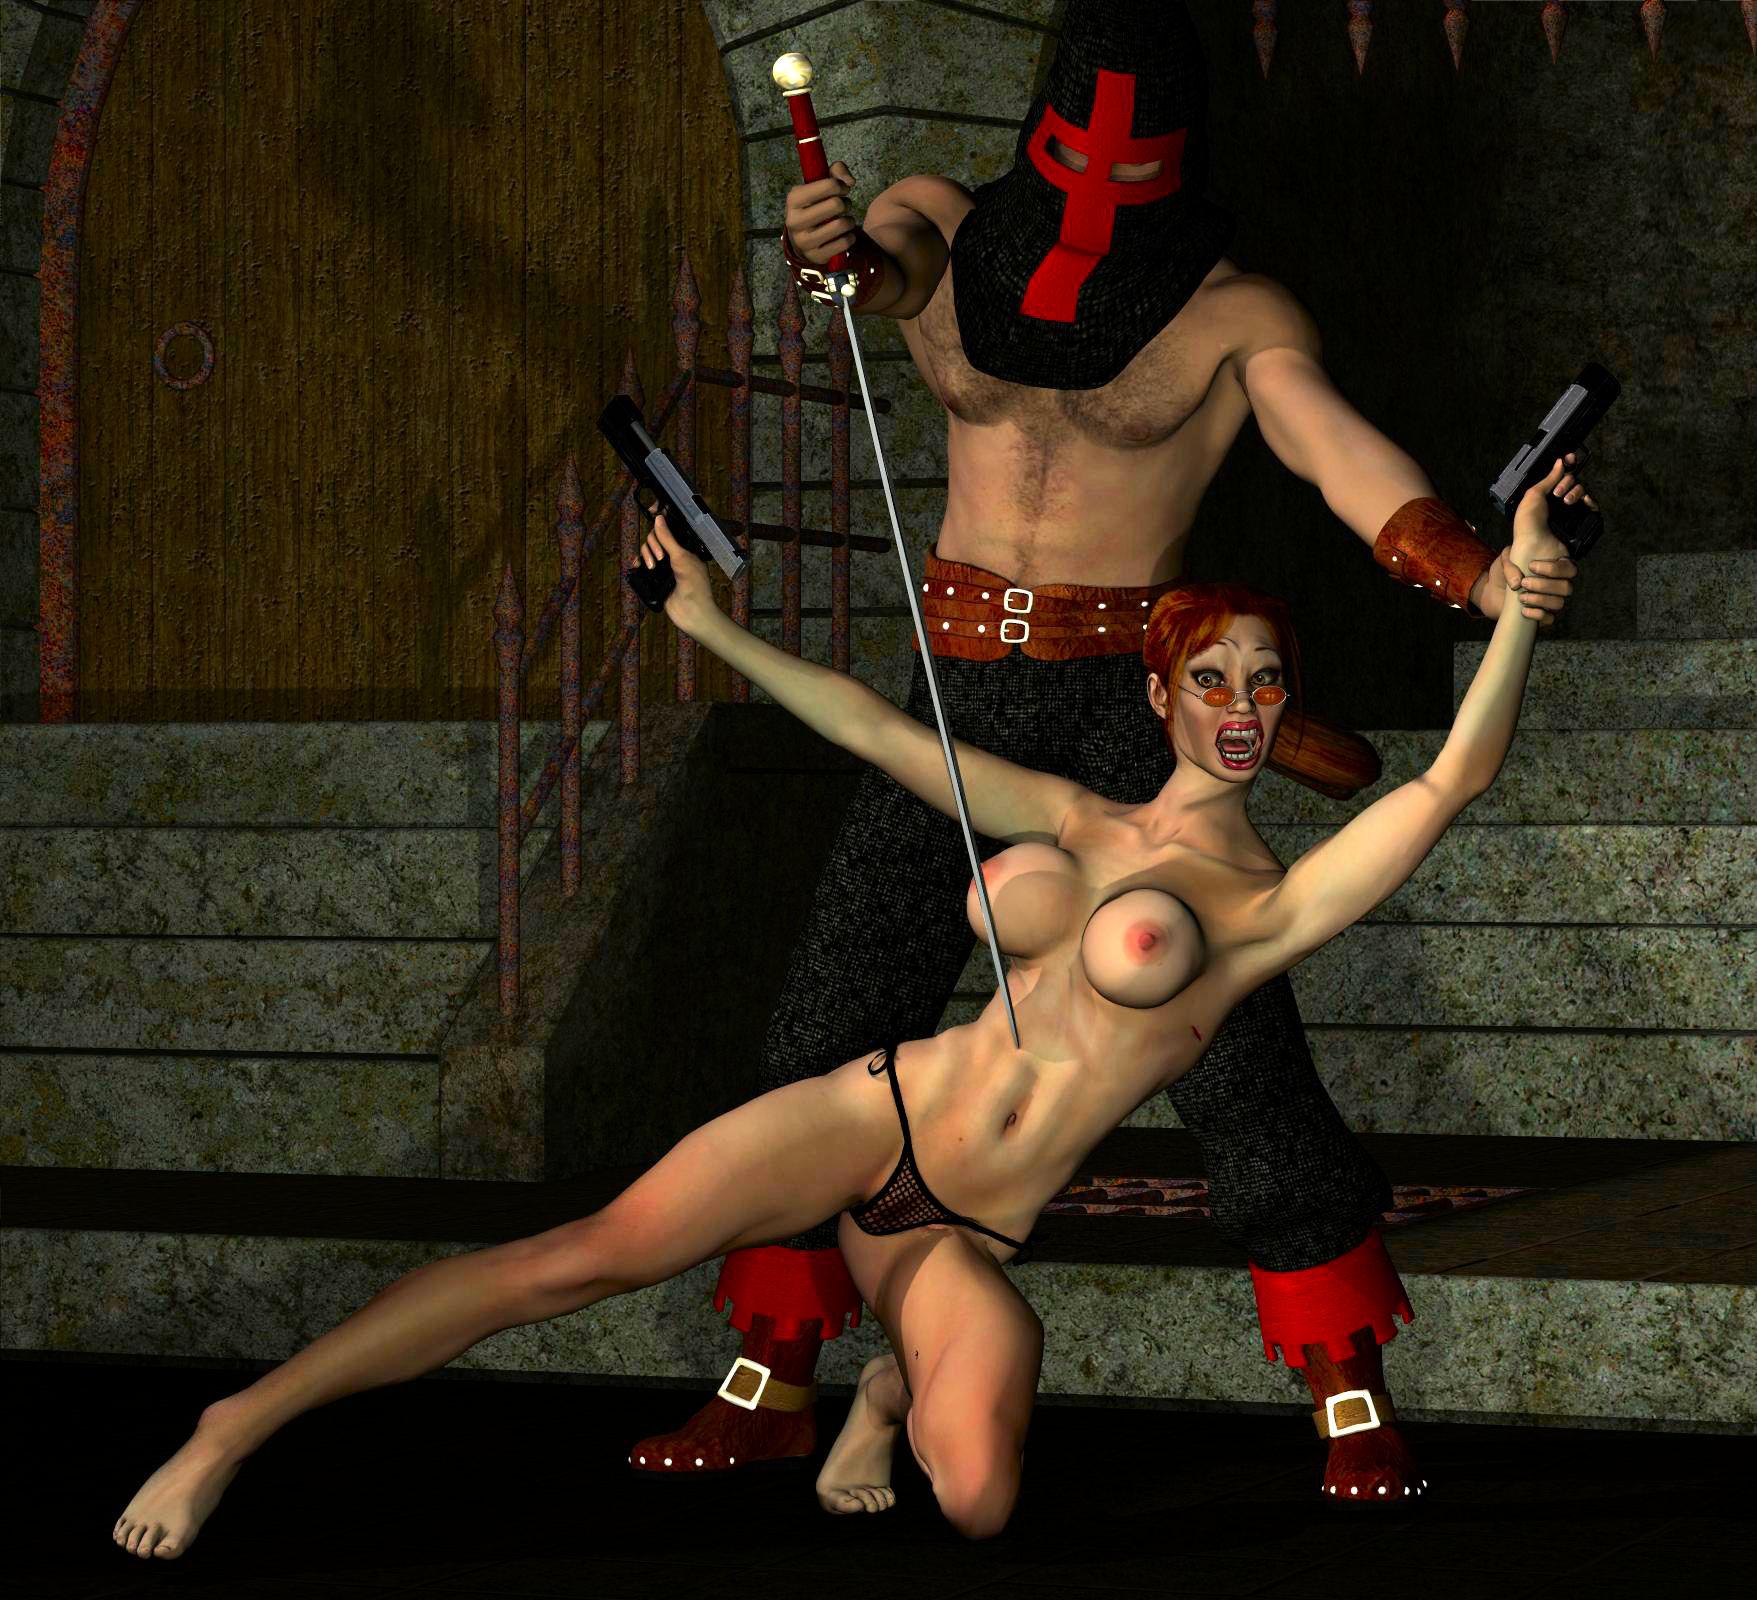 Hentai troll 3d lara croft sexy nerdy slut